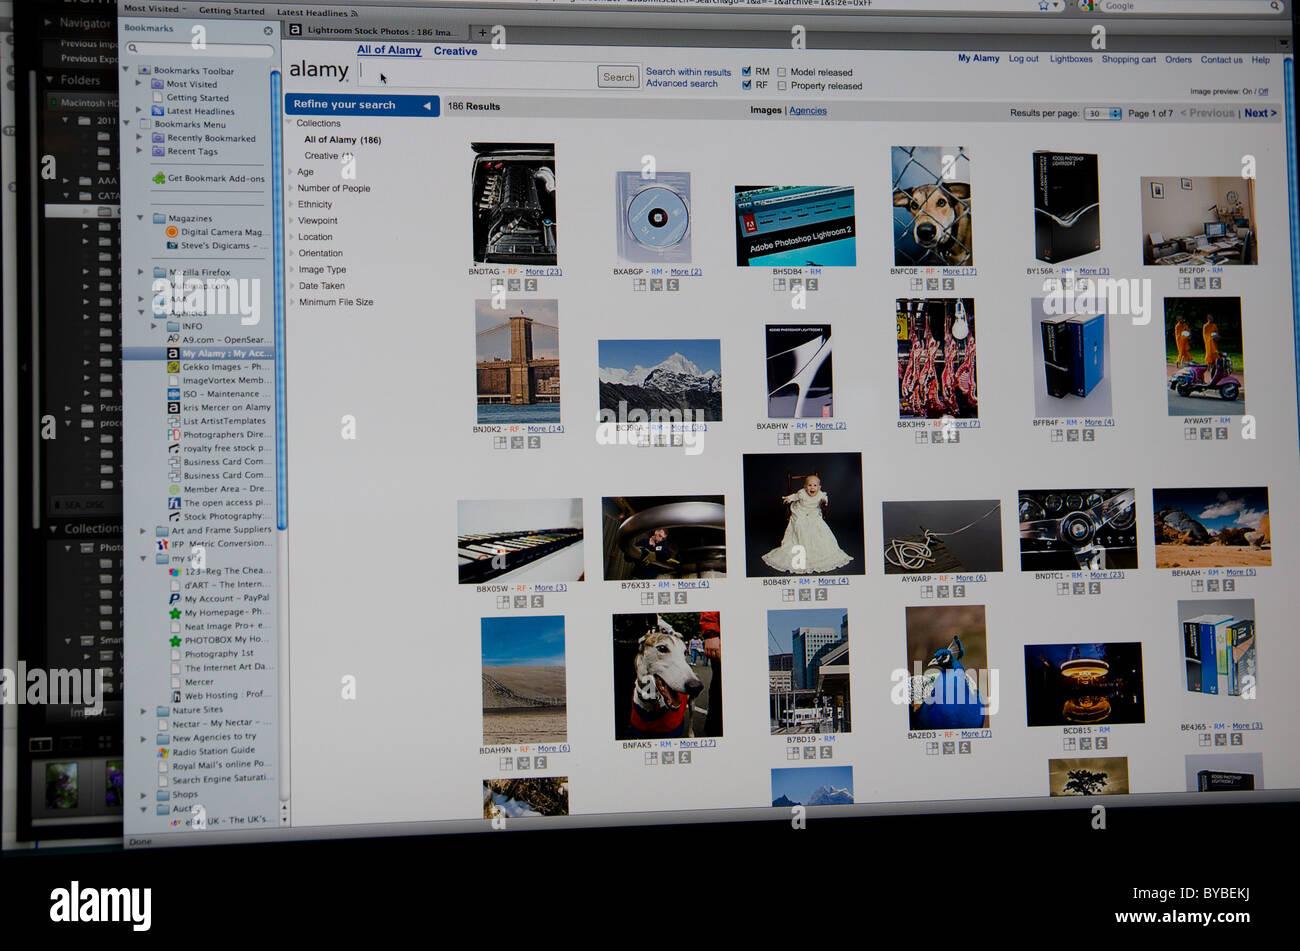 Alamy stock photography website Stock Photo